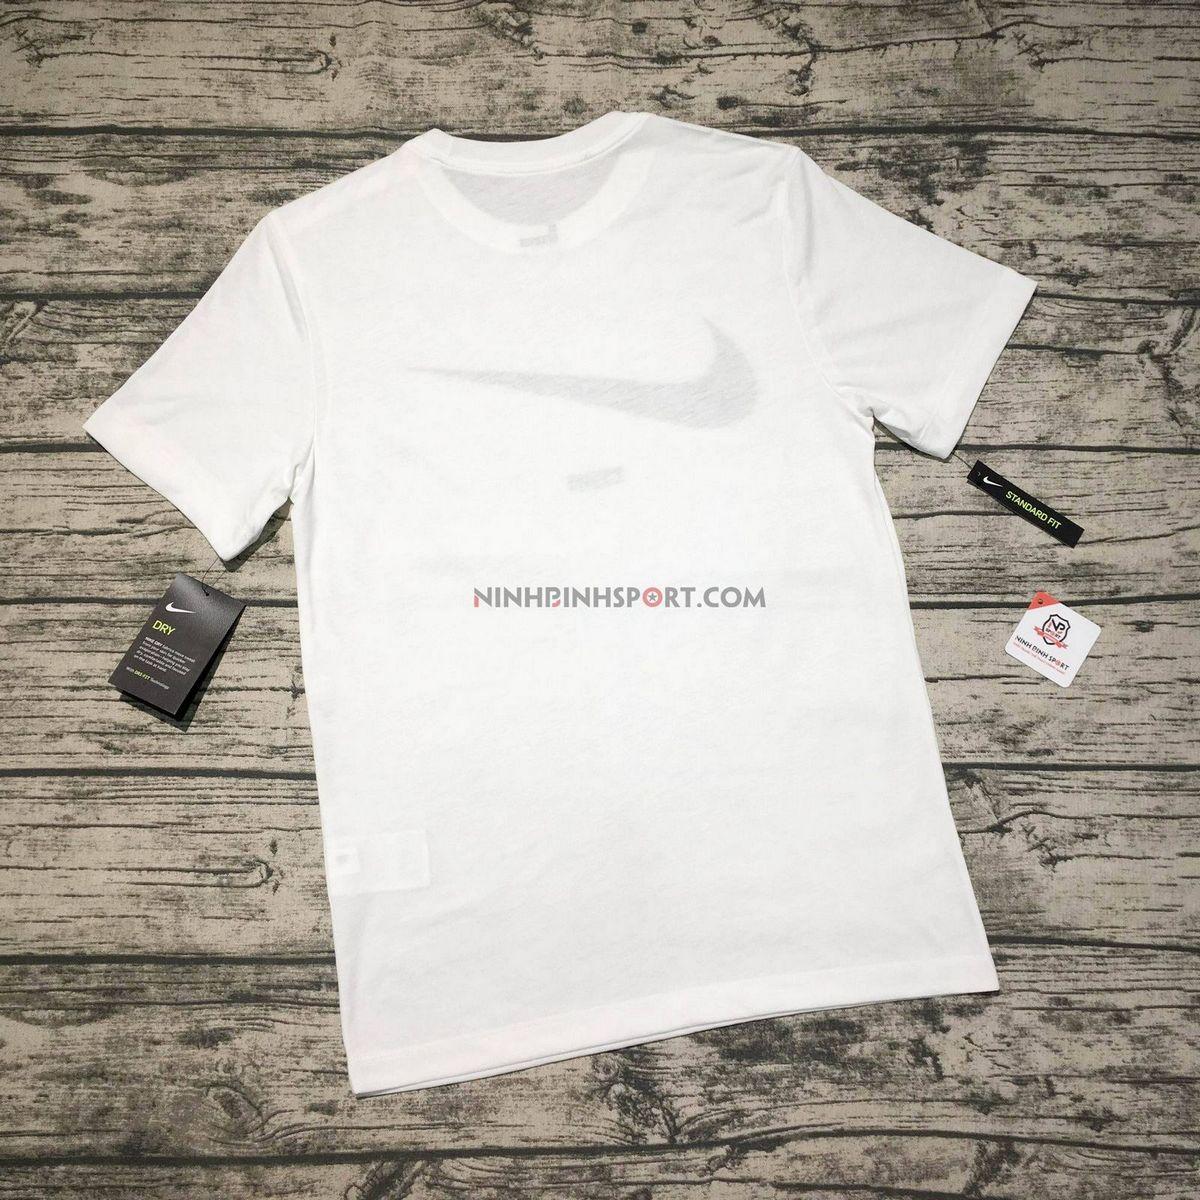 Áo thể thao nam Nike Dri-fit Printed BQ1854-100